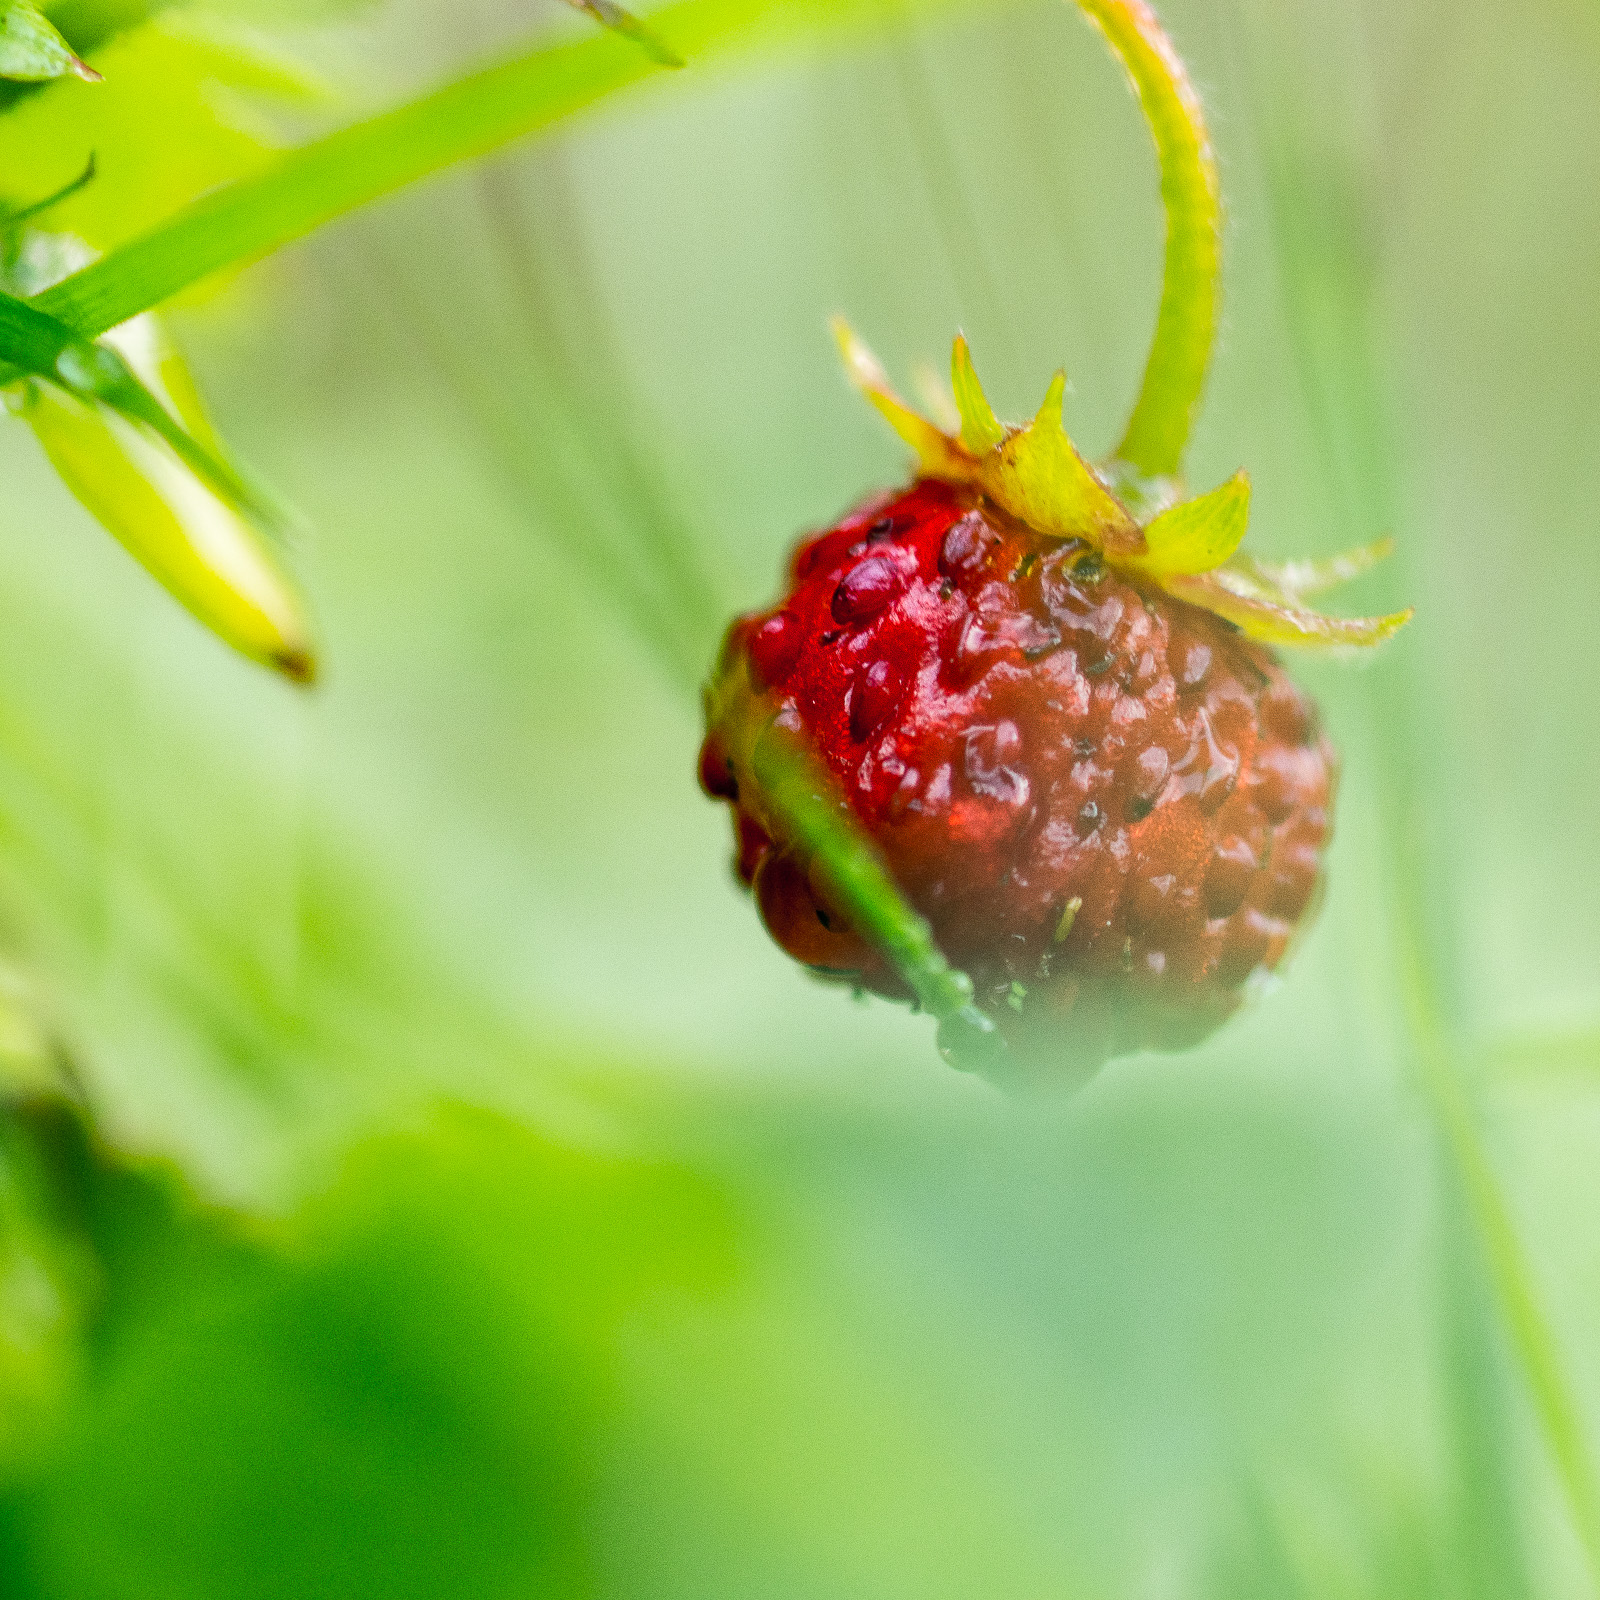 Wald-Erdbeere in Nahaufnahme